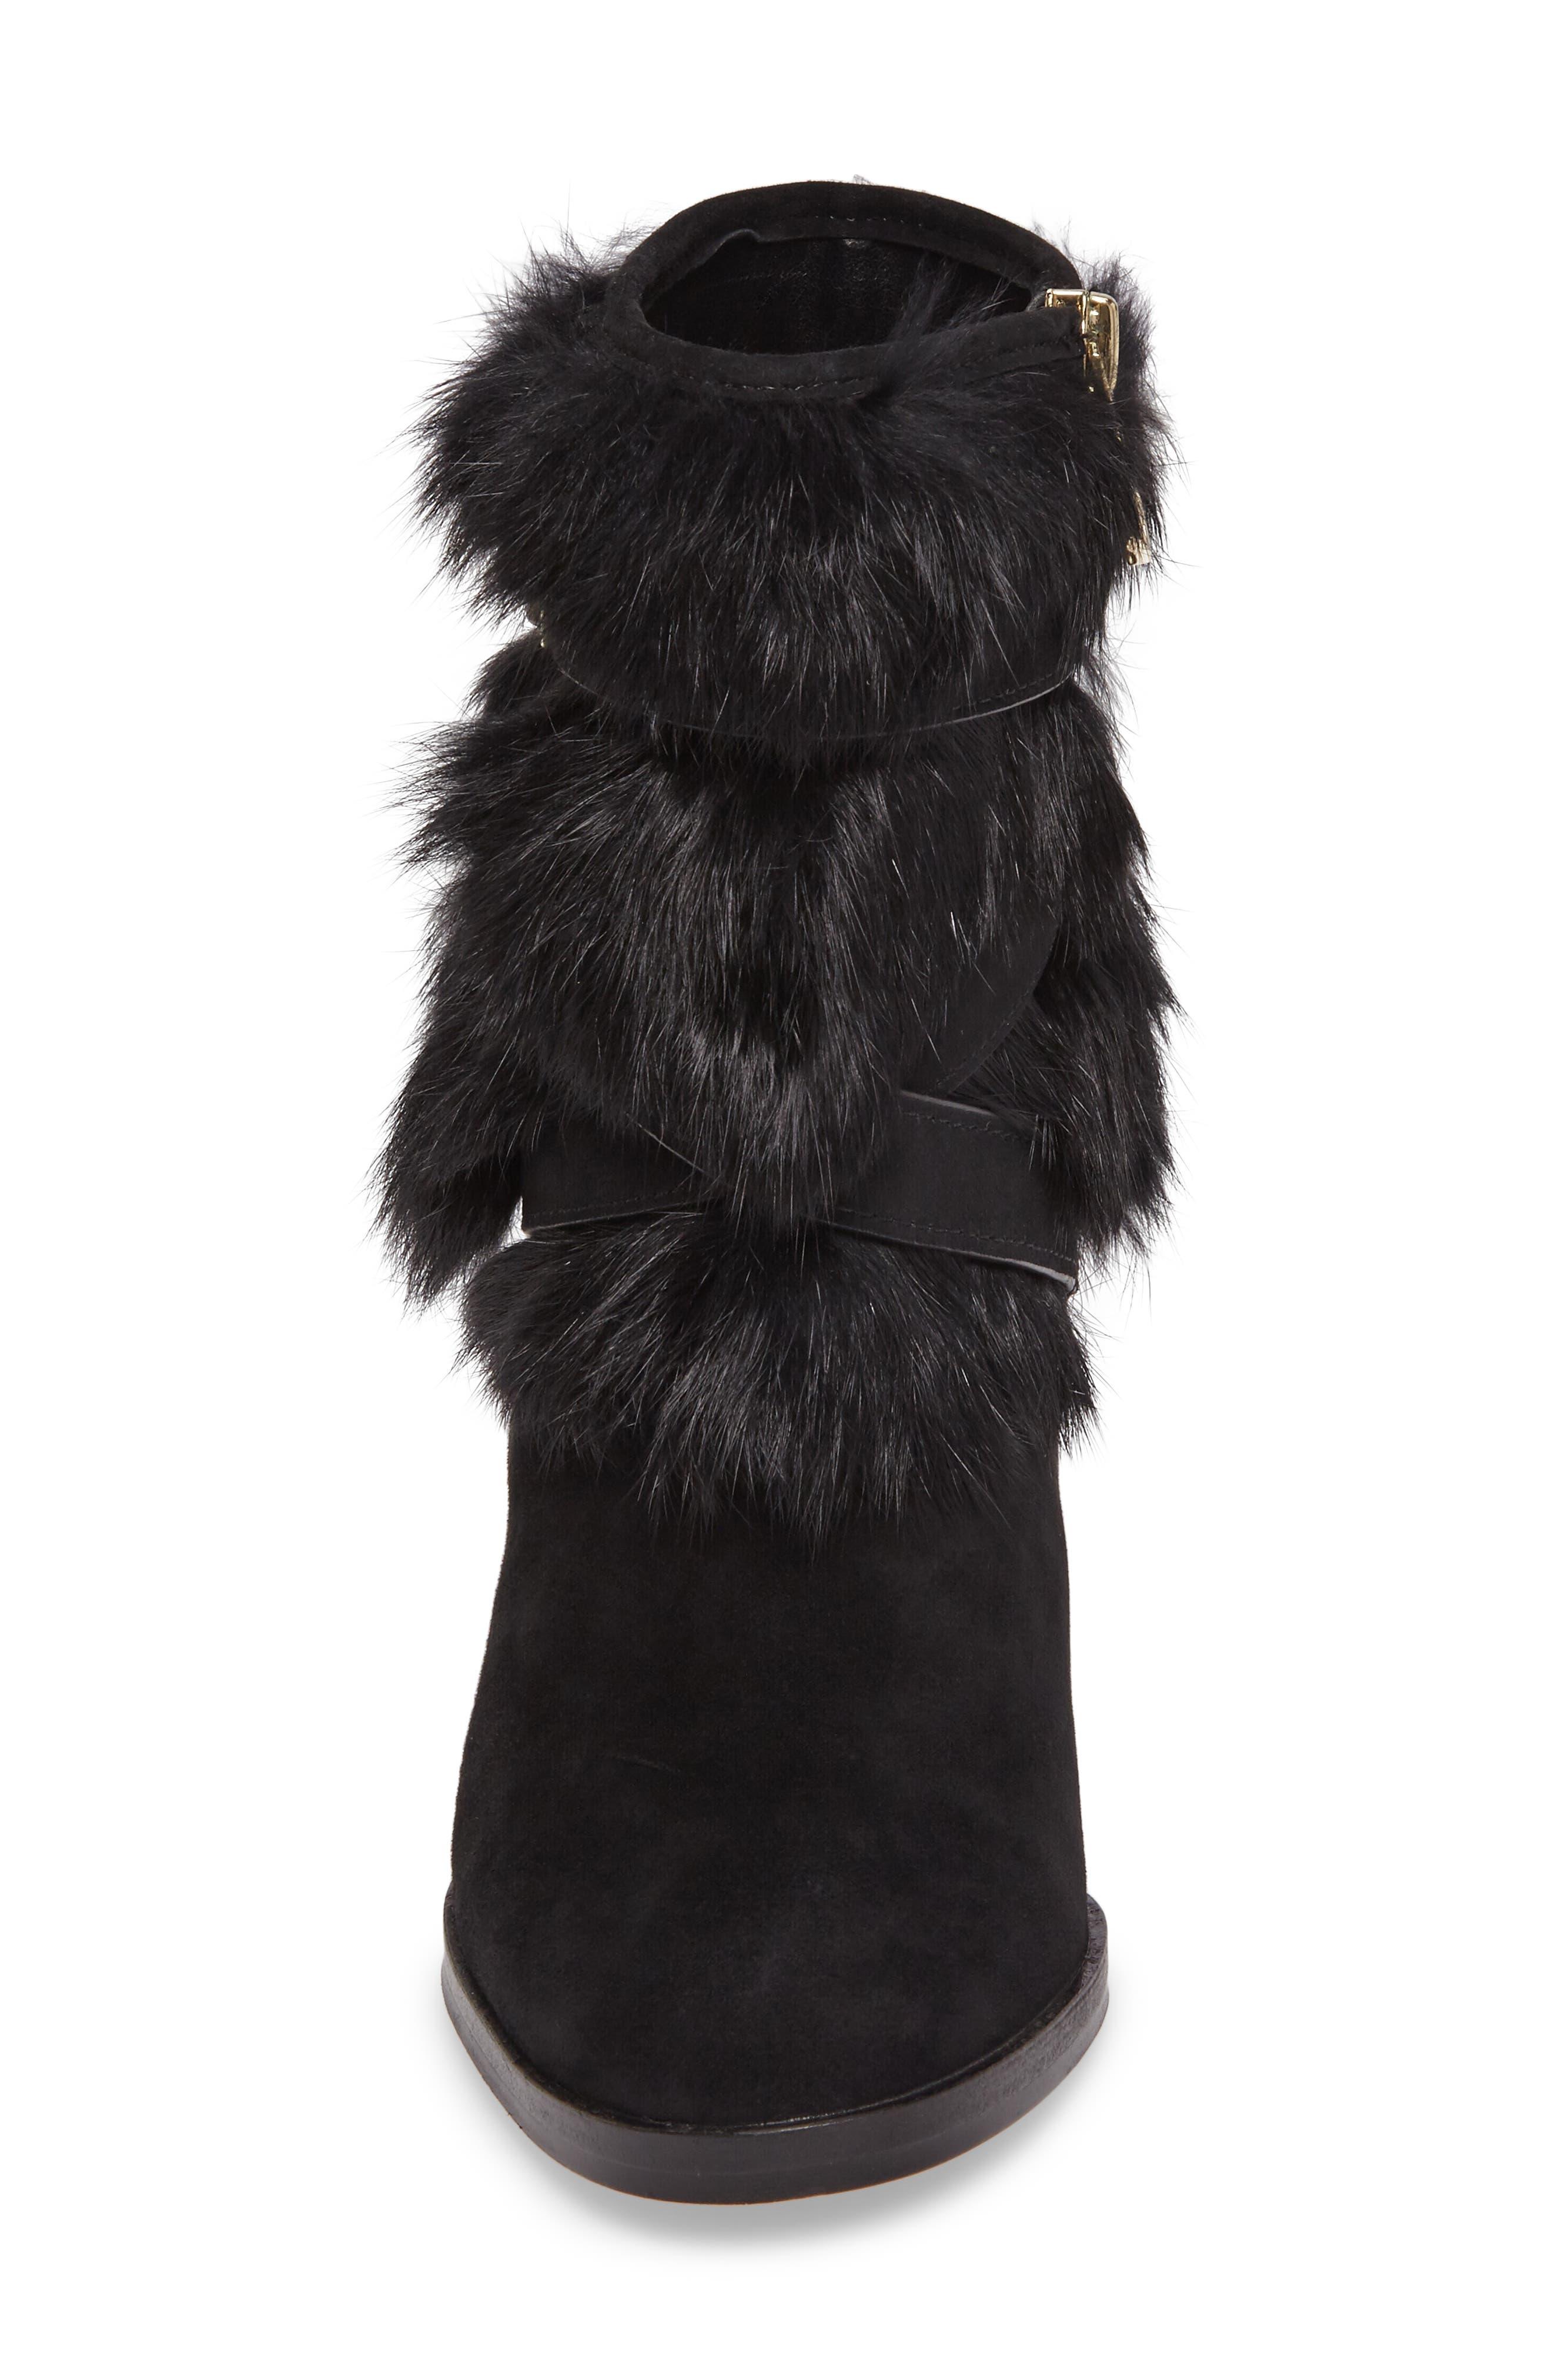 Yuma Genuine Rabbit Fur Bootie,                             Alternate thumbnail 4, color,                             Black Suede